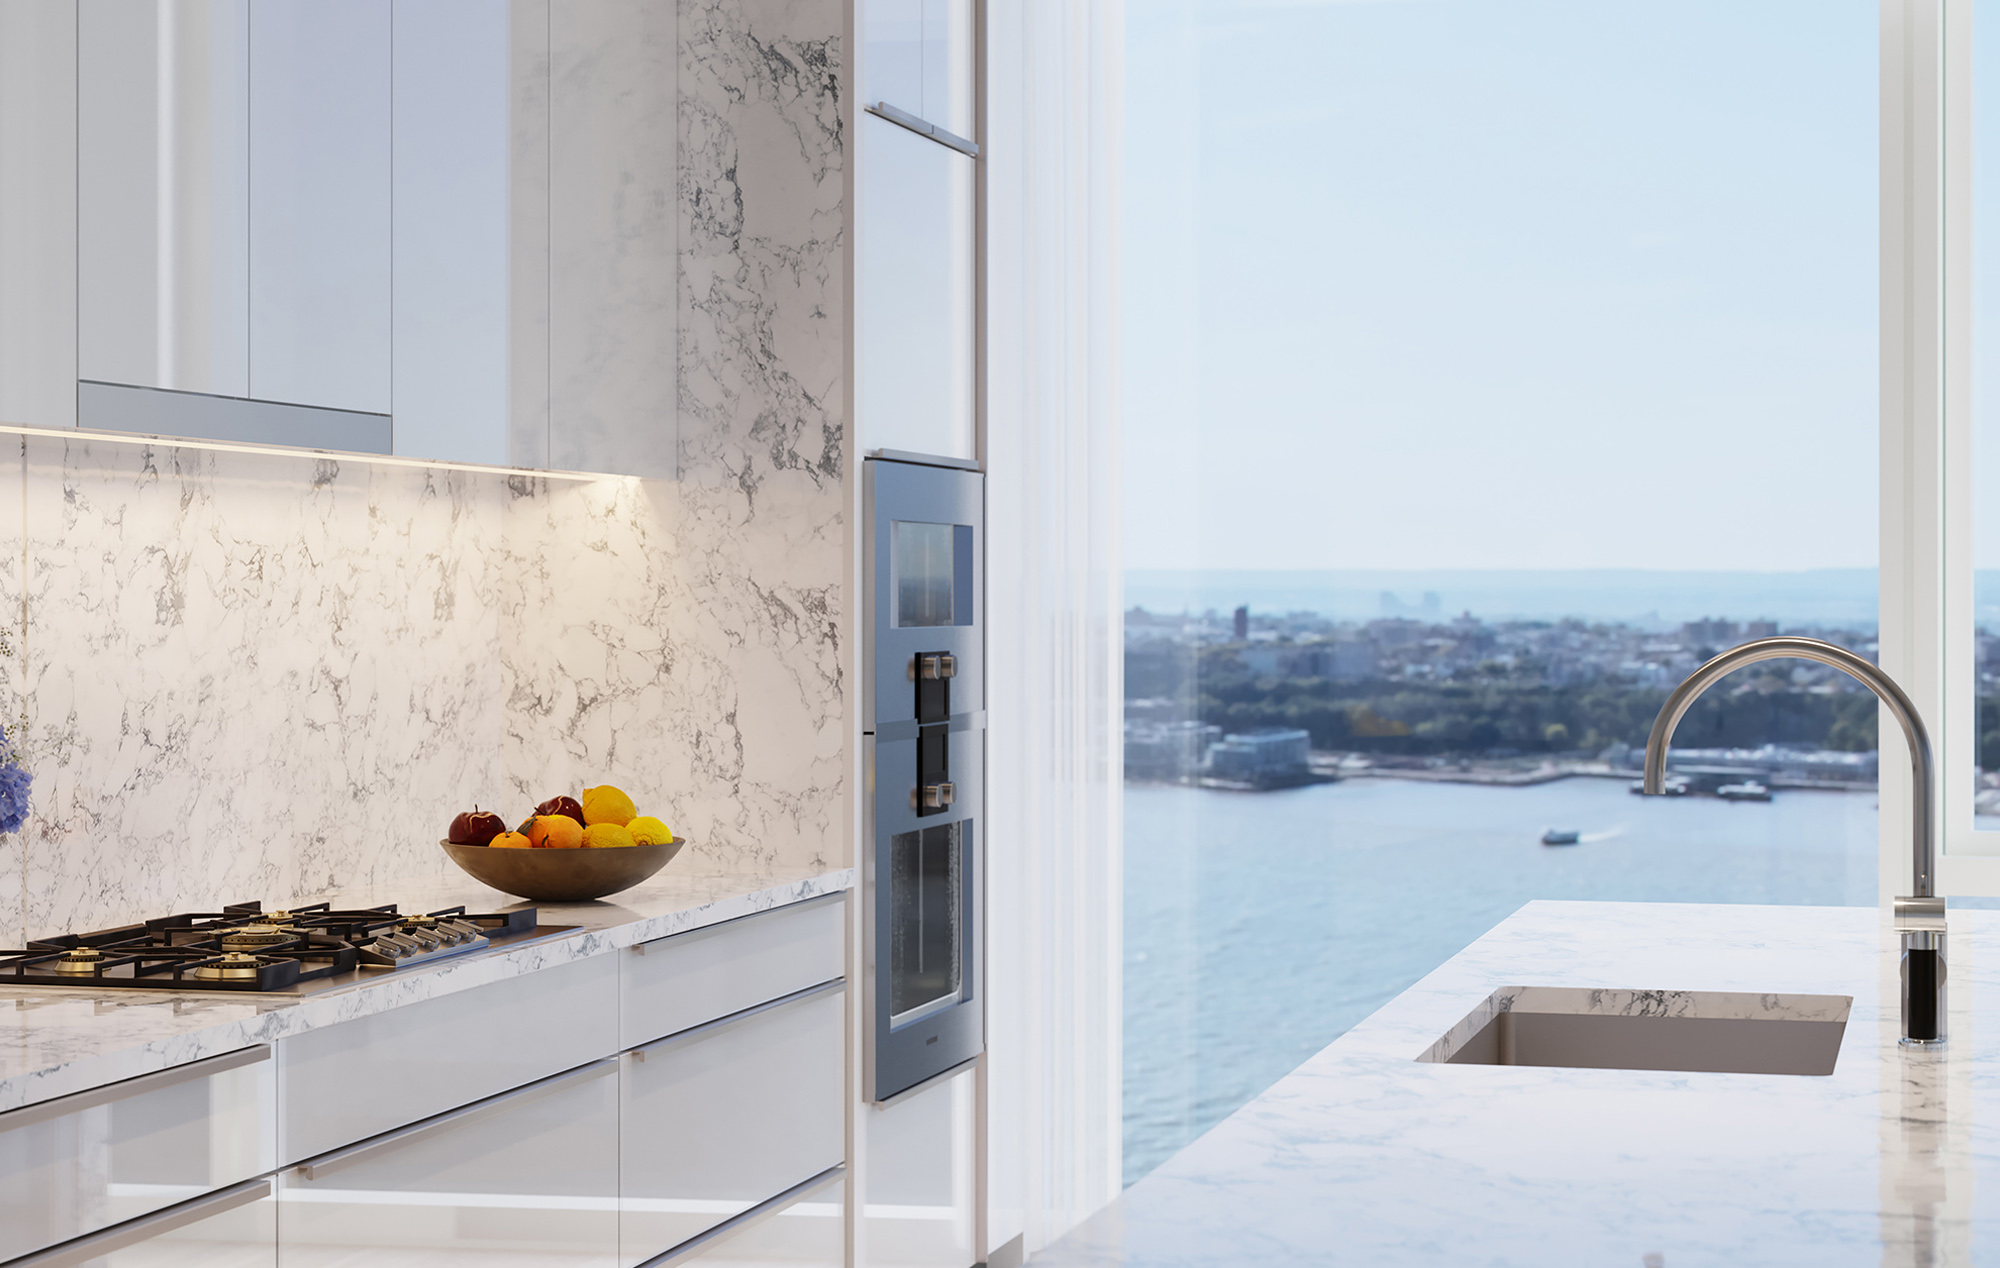 Luxury NYC Condo Kitchen